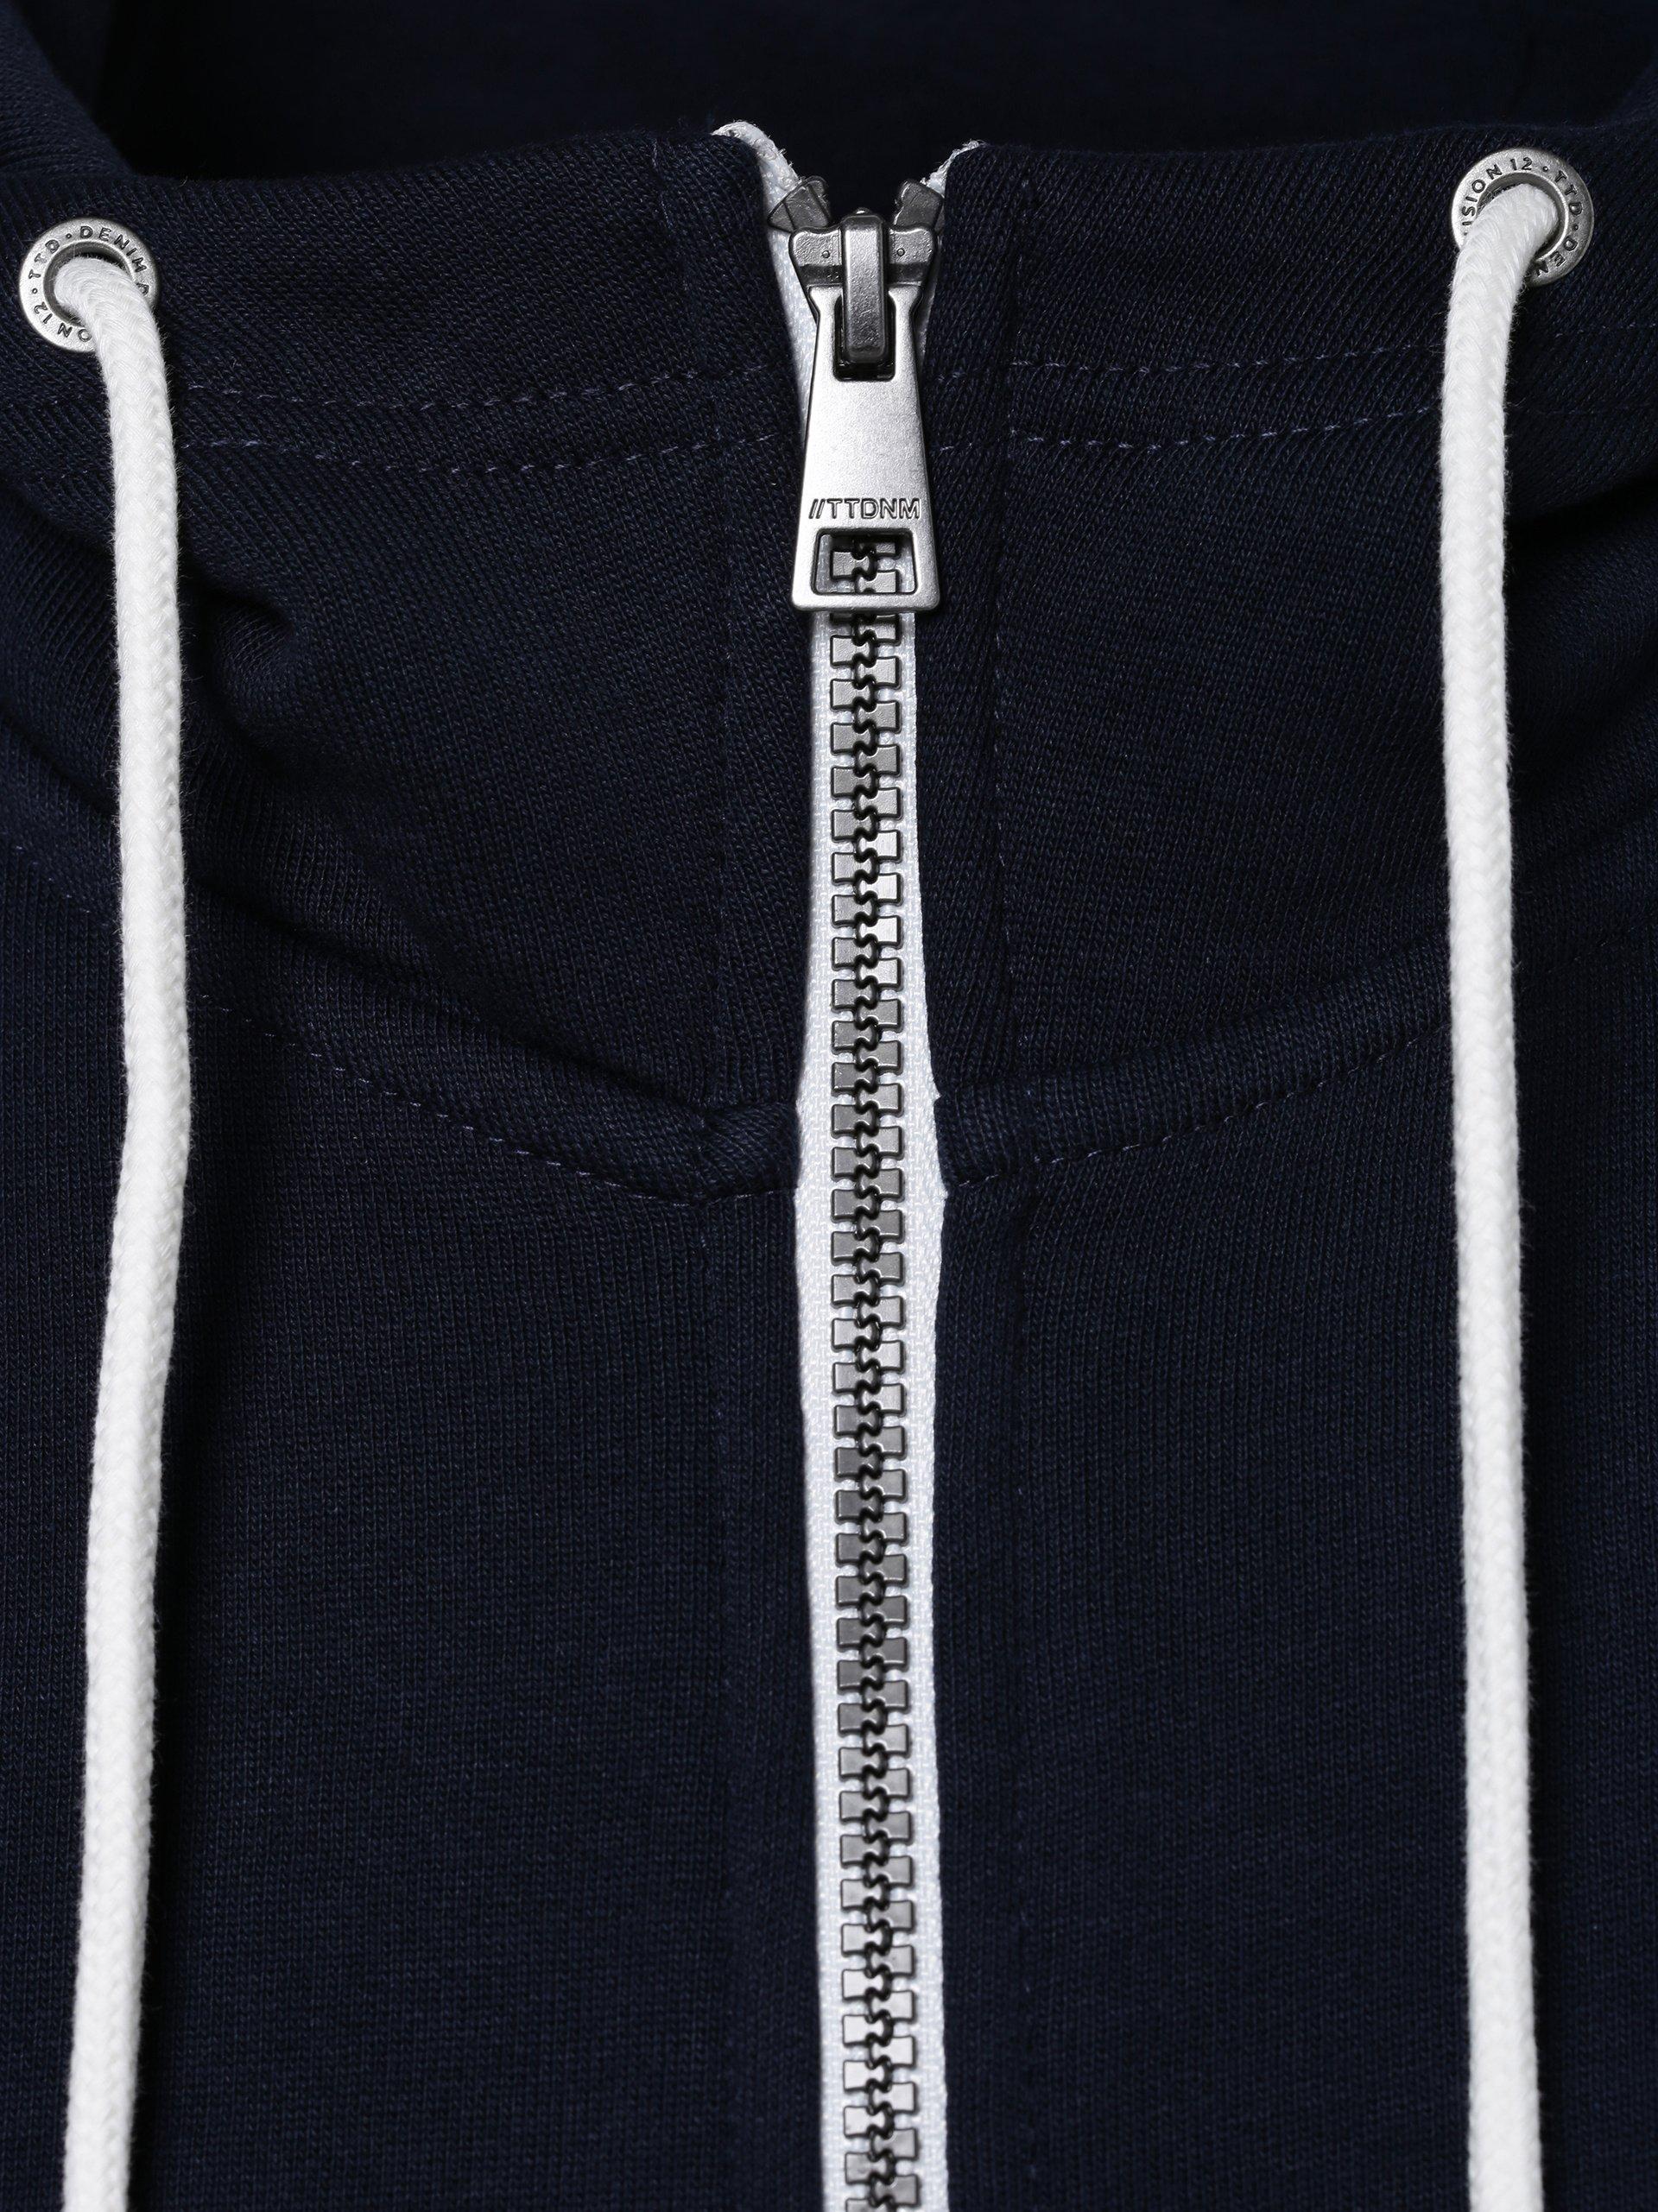 Tom Tailor Denim Męska bluza rozpinana